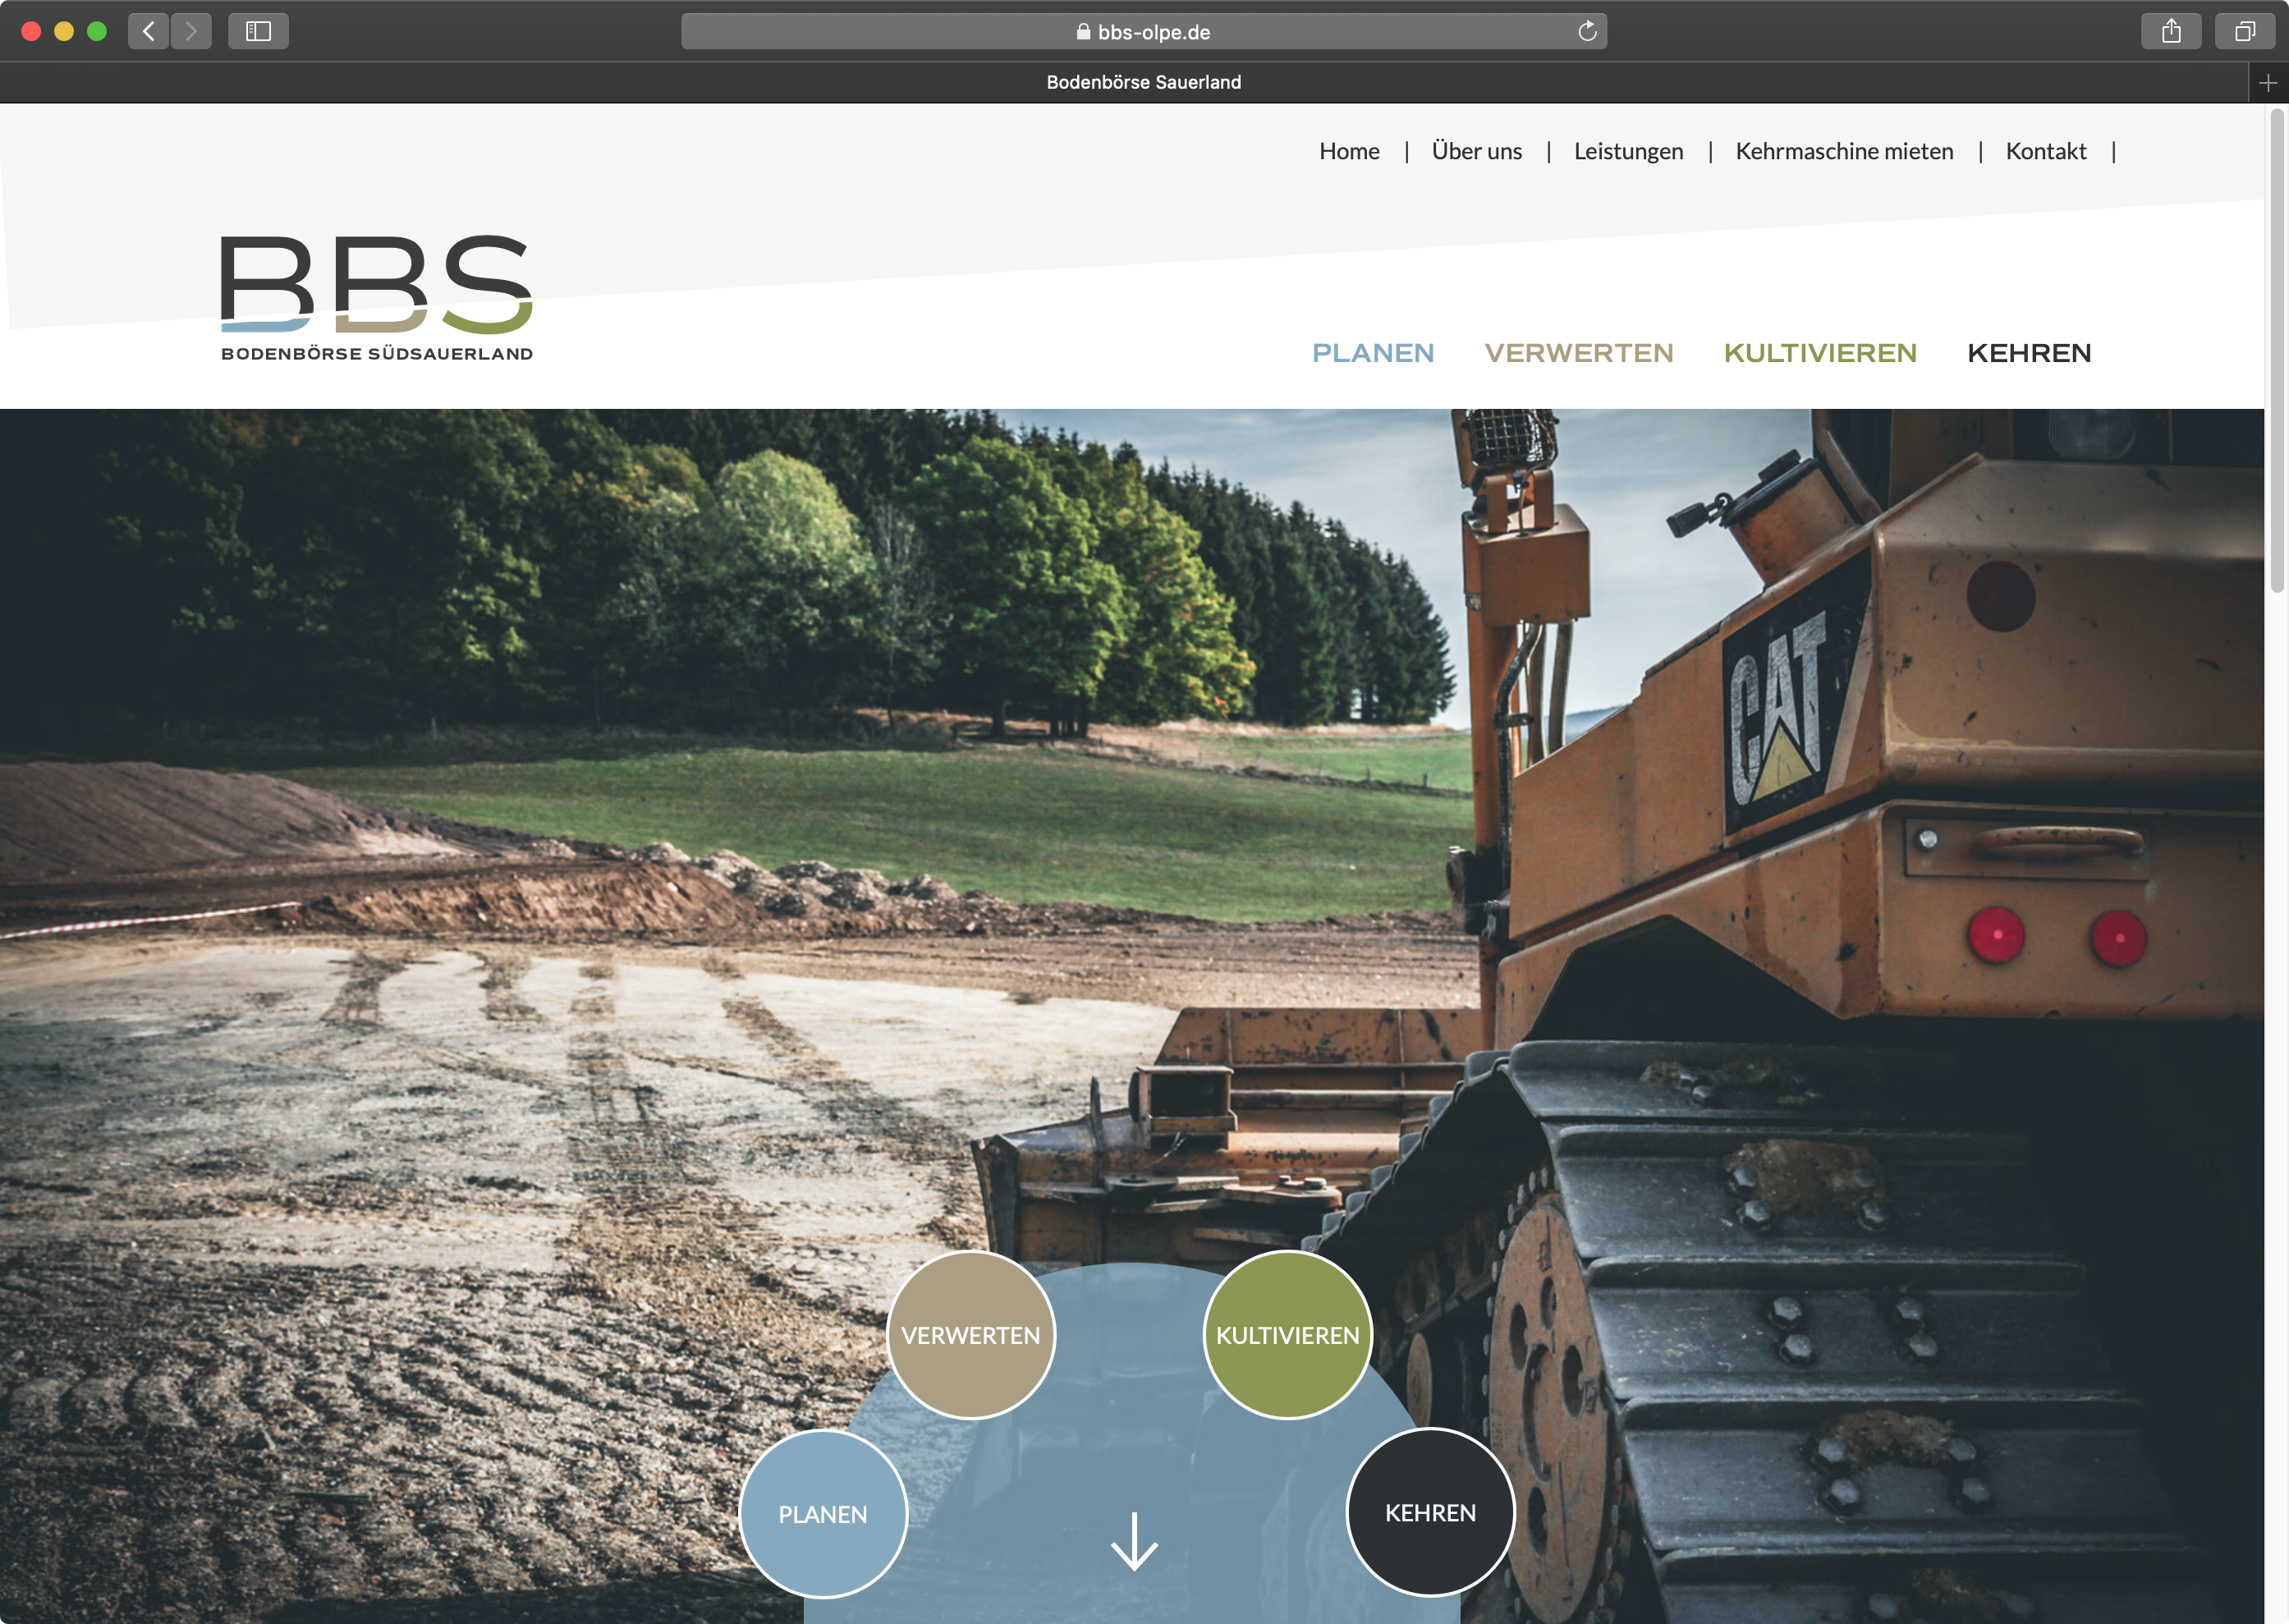 Bbs website 1